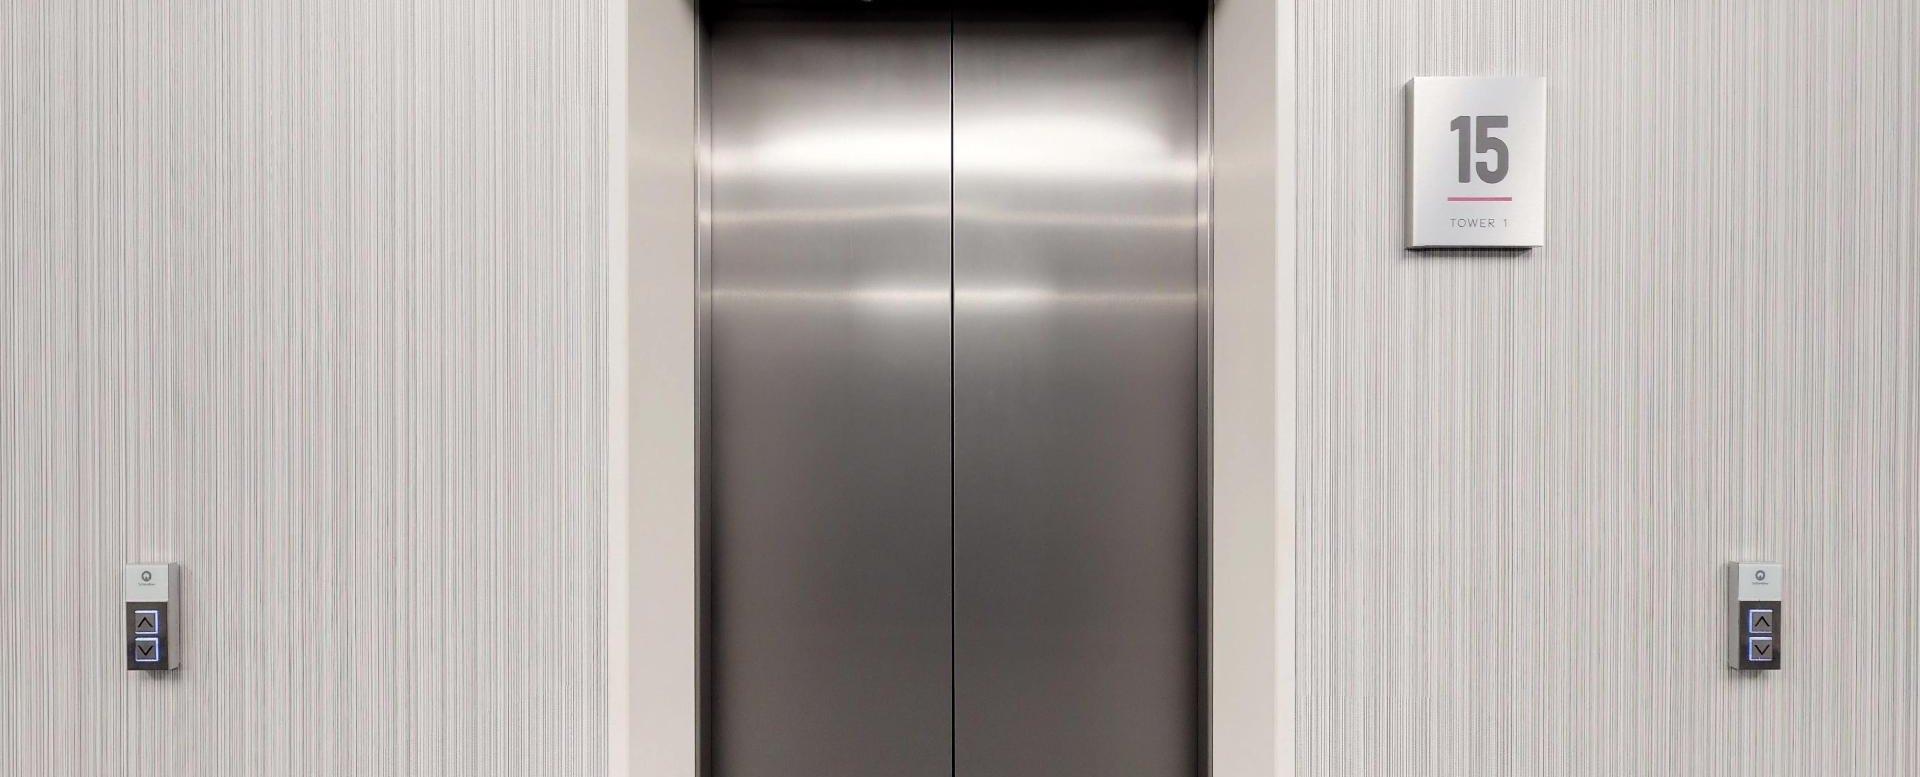 Výťah na 15. poschodí  Panorama Towers - Eurovea City